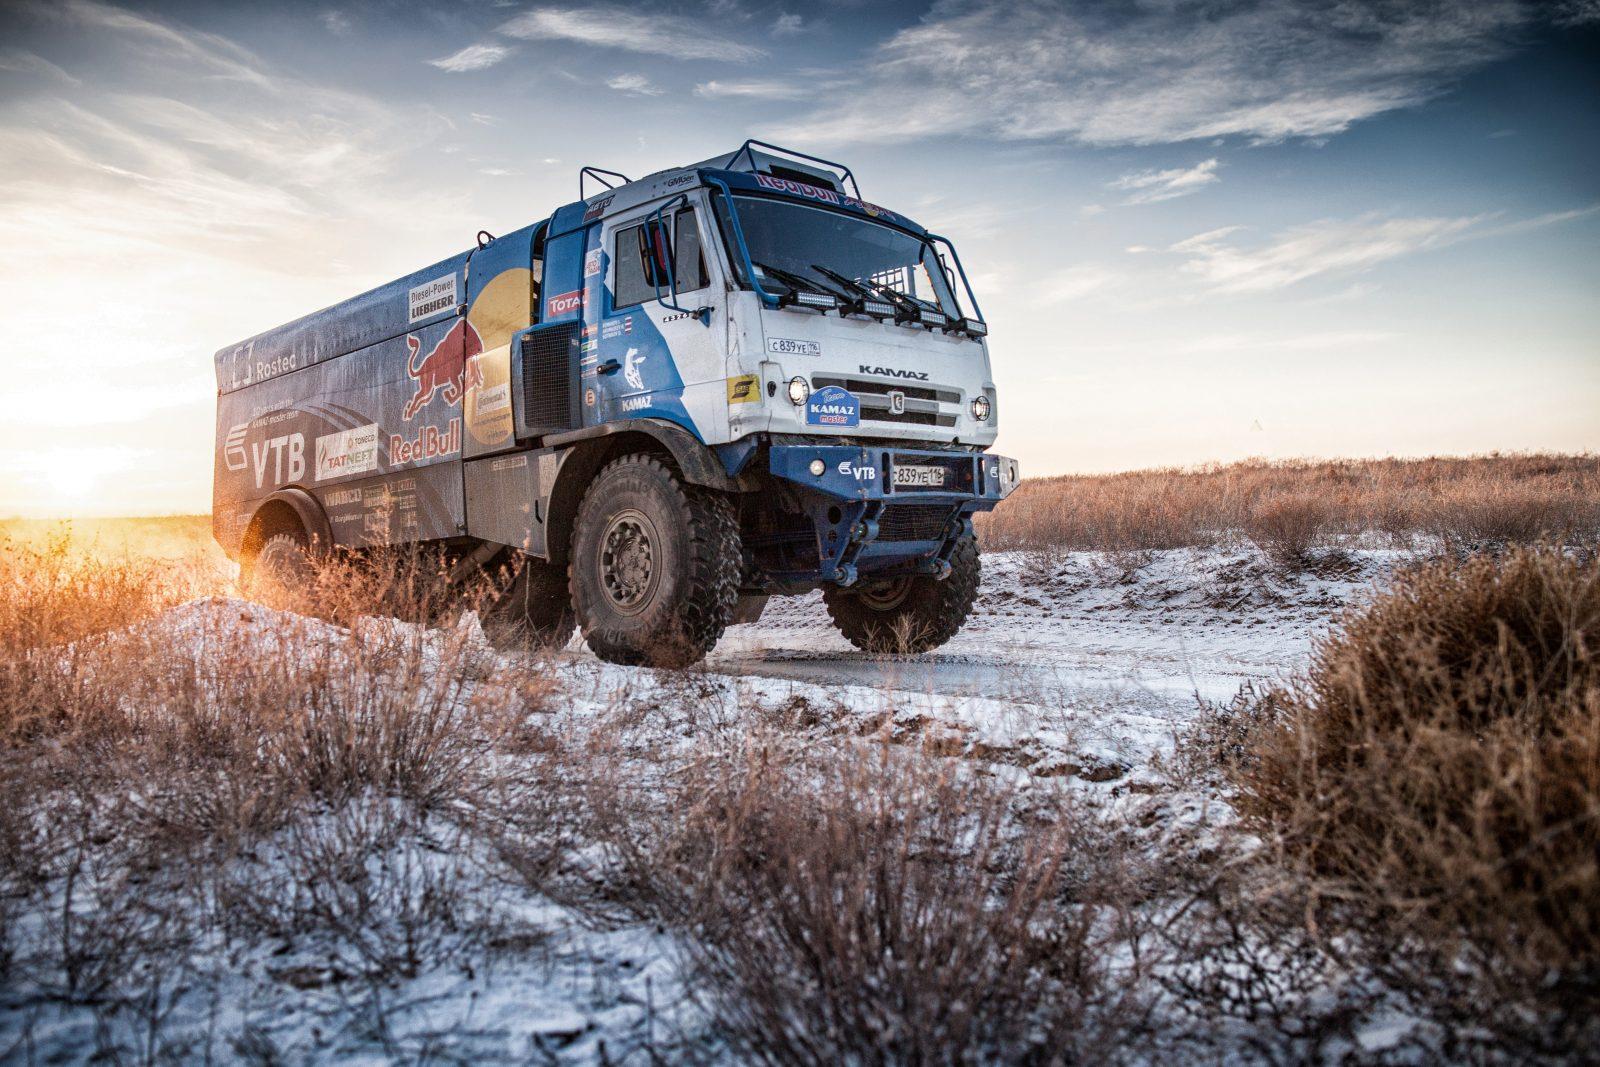 camiões T4 do dakar — Kamaz